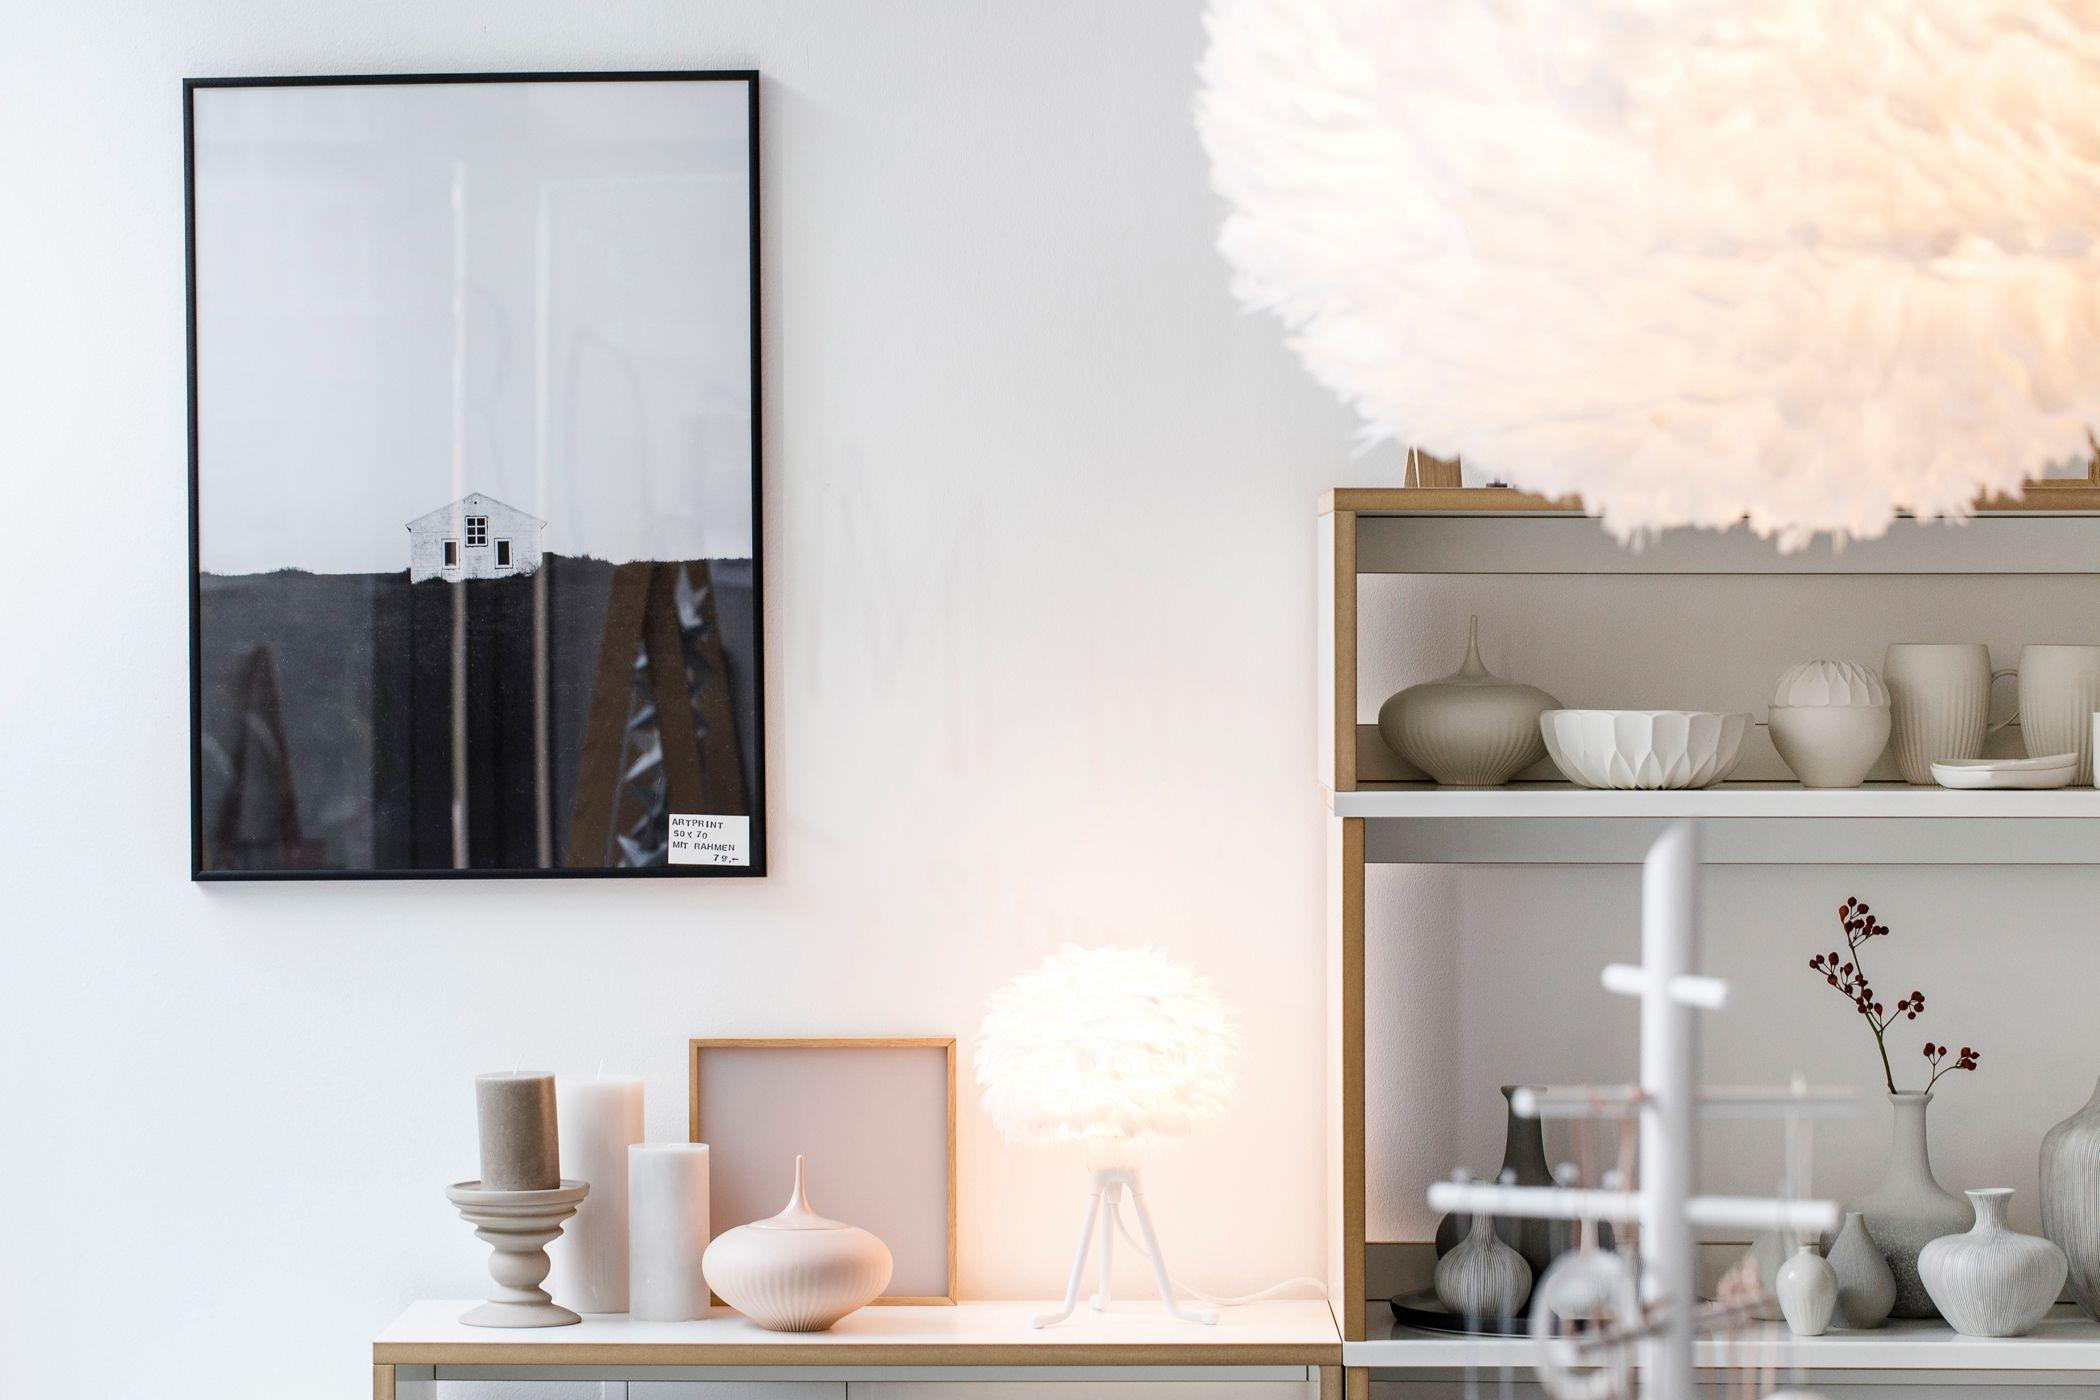 Room Home Interior Designinterior Design Magazinechristmas Gifts